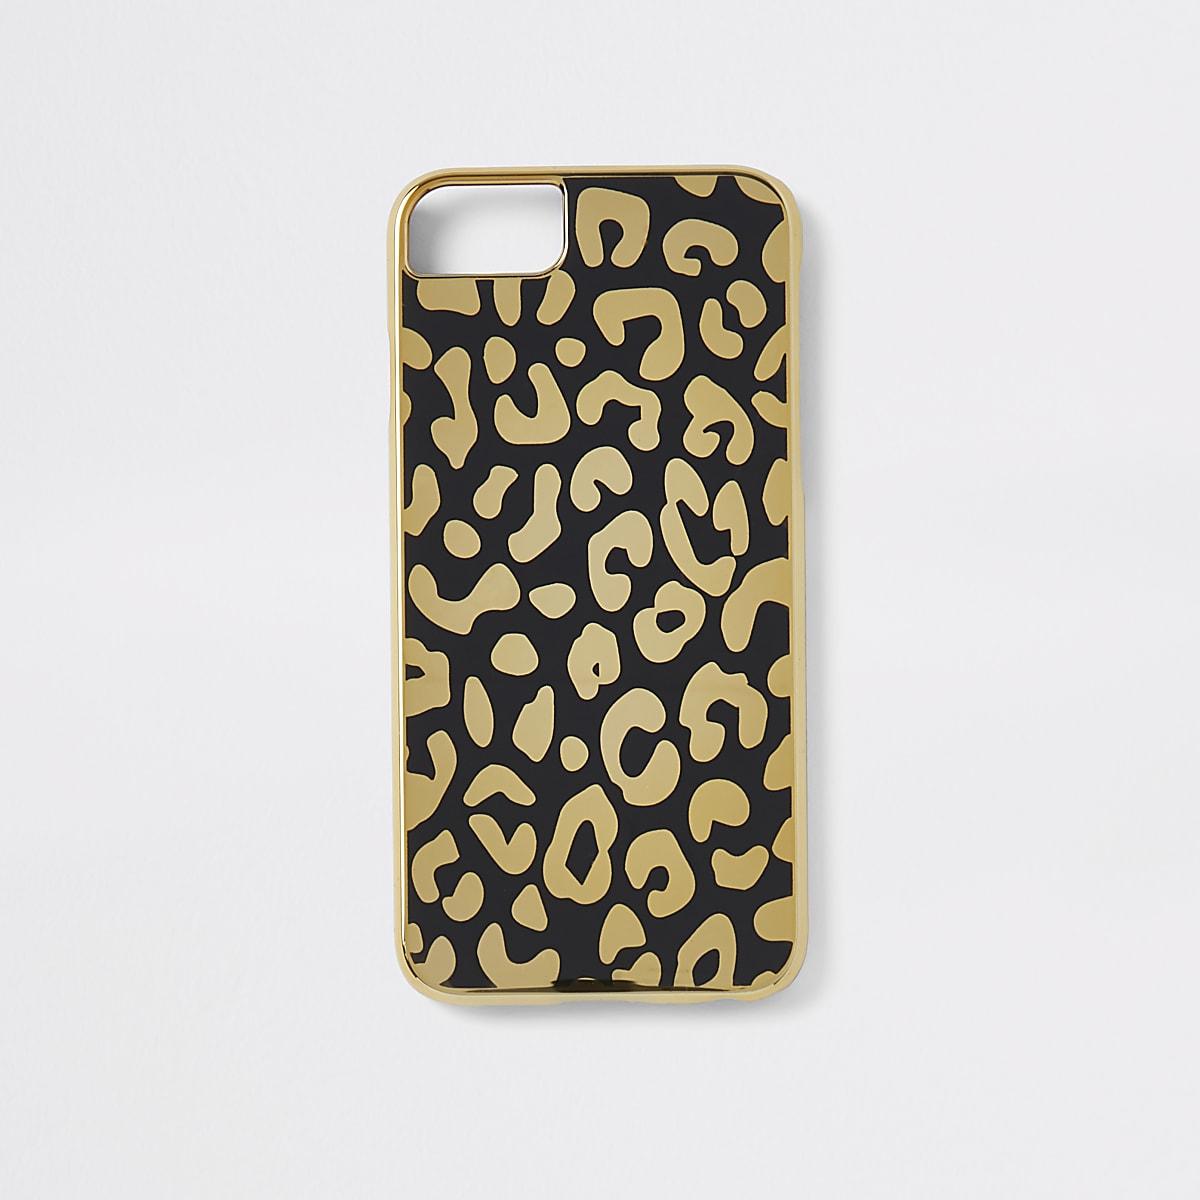 Goudkleurige hoes voor iPhone met luipaardprint